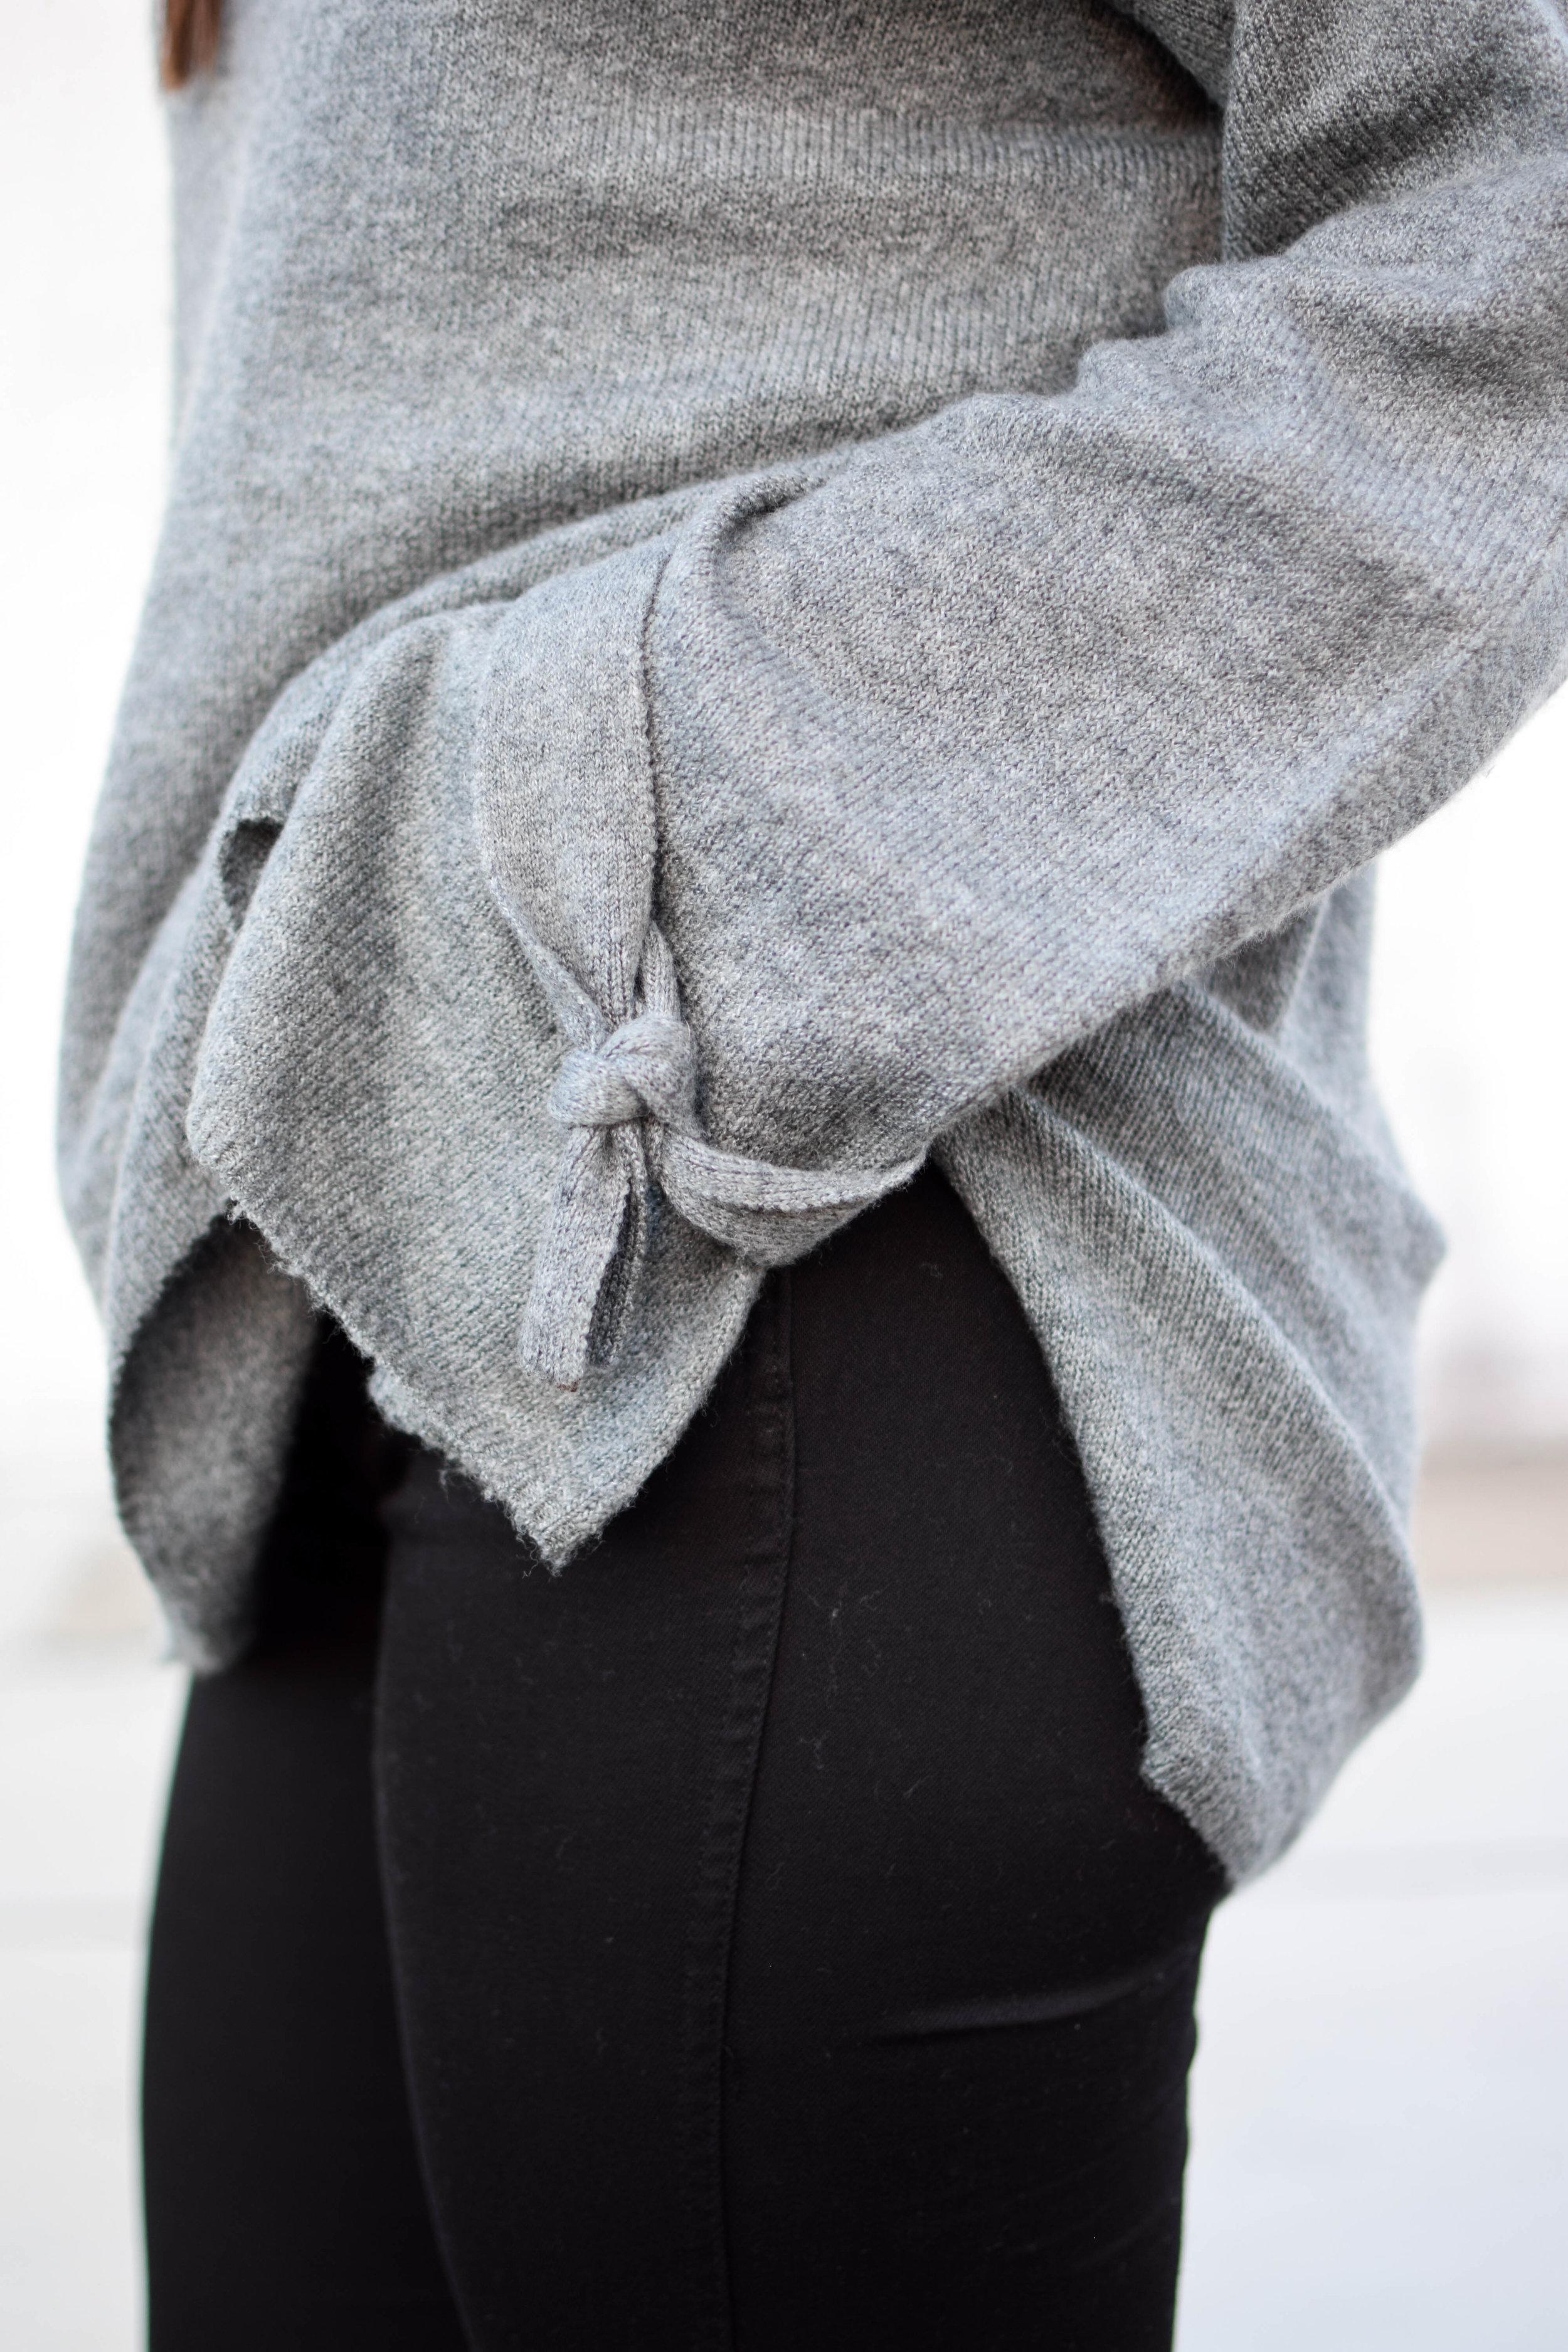 fall fashion / fall outfit idea / fall outfit inspiration / fall closet essentials / black denim / tie sleeve sweater